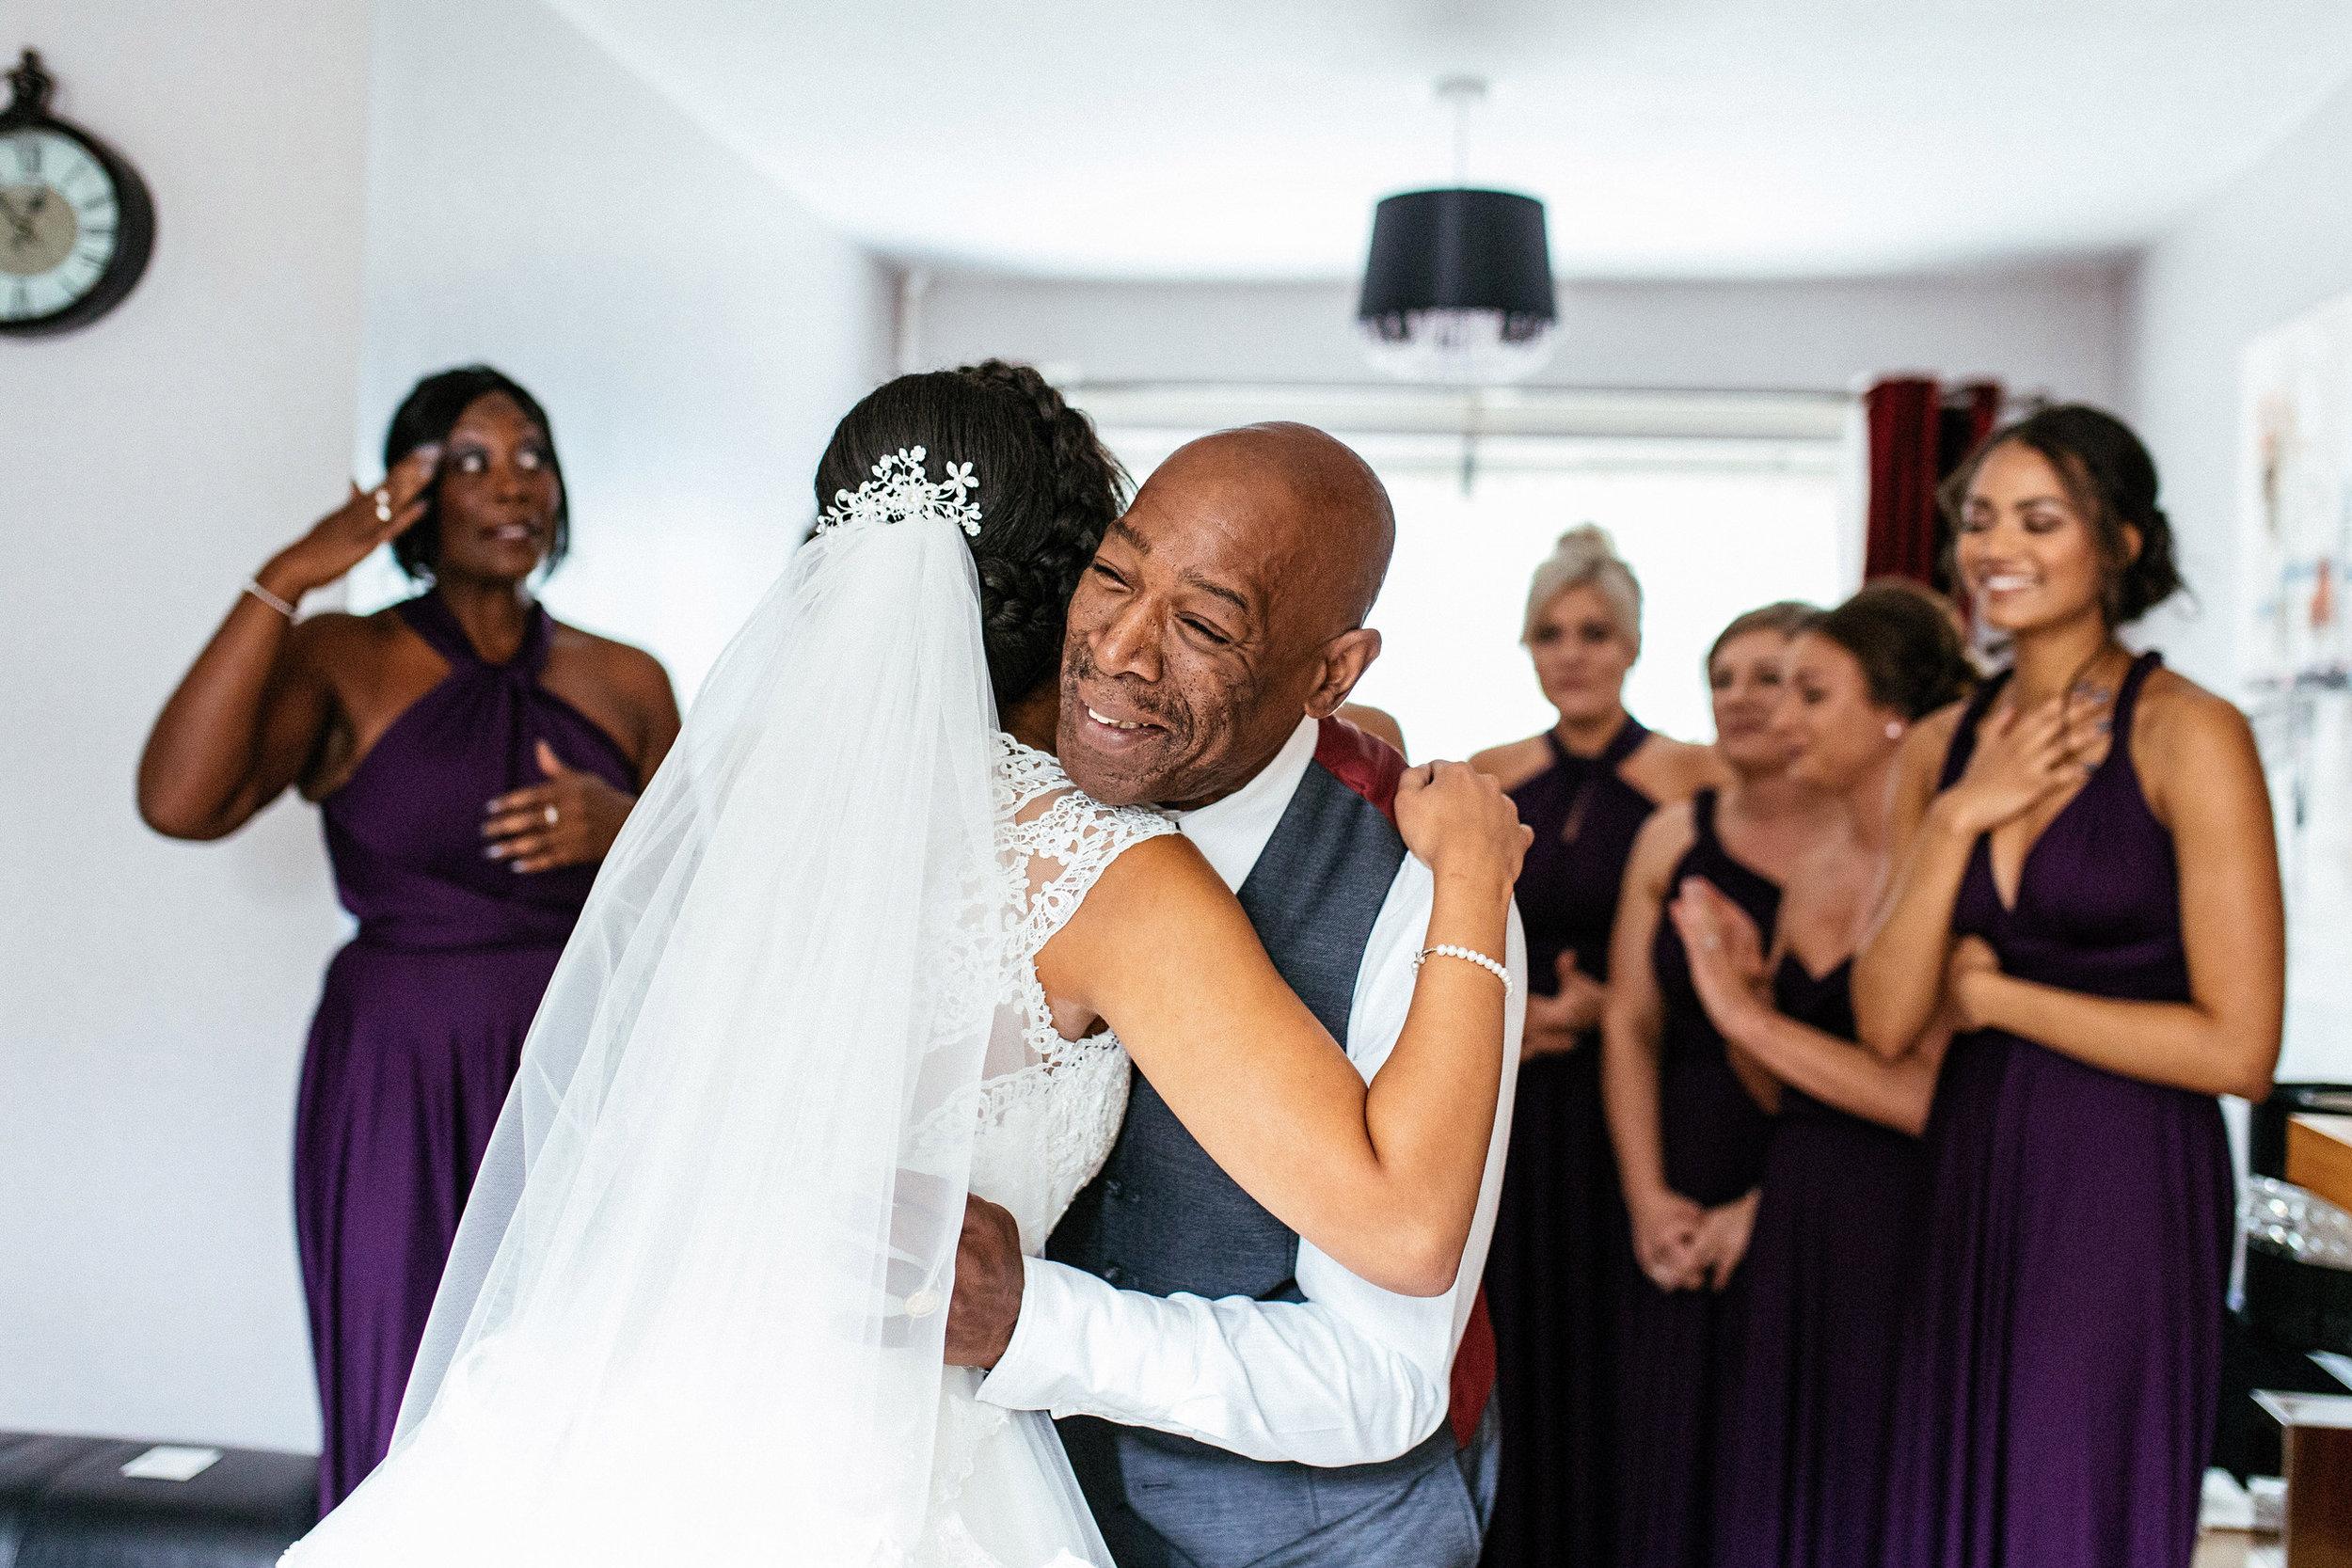 The-Bond-Company-Wedding-Photography-16-1.jpg